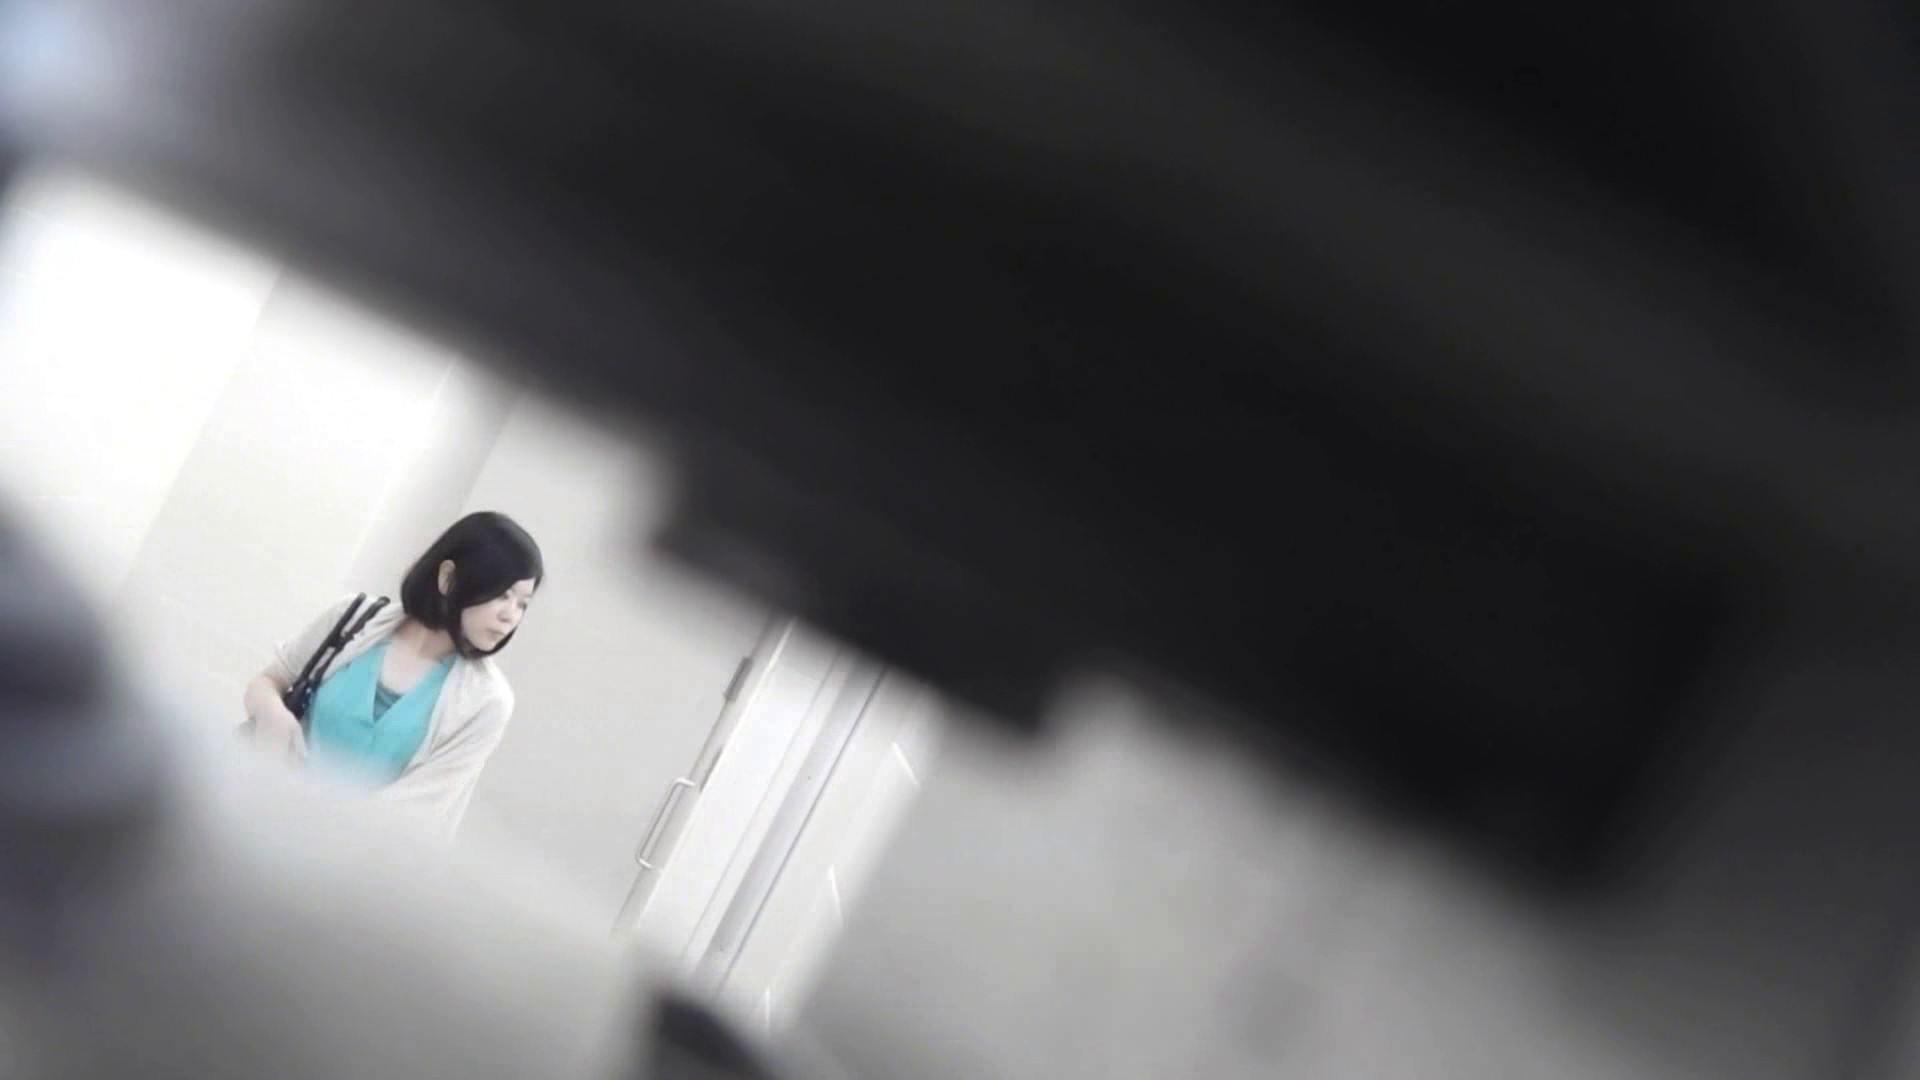 vol.25三十時間潜り、一つしか出会えない完璧桃尻編 byお銀 洗面所 のぞき動画キャプチャ 96連発 59